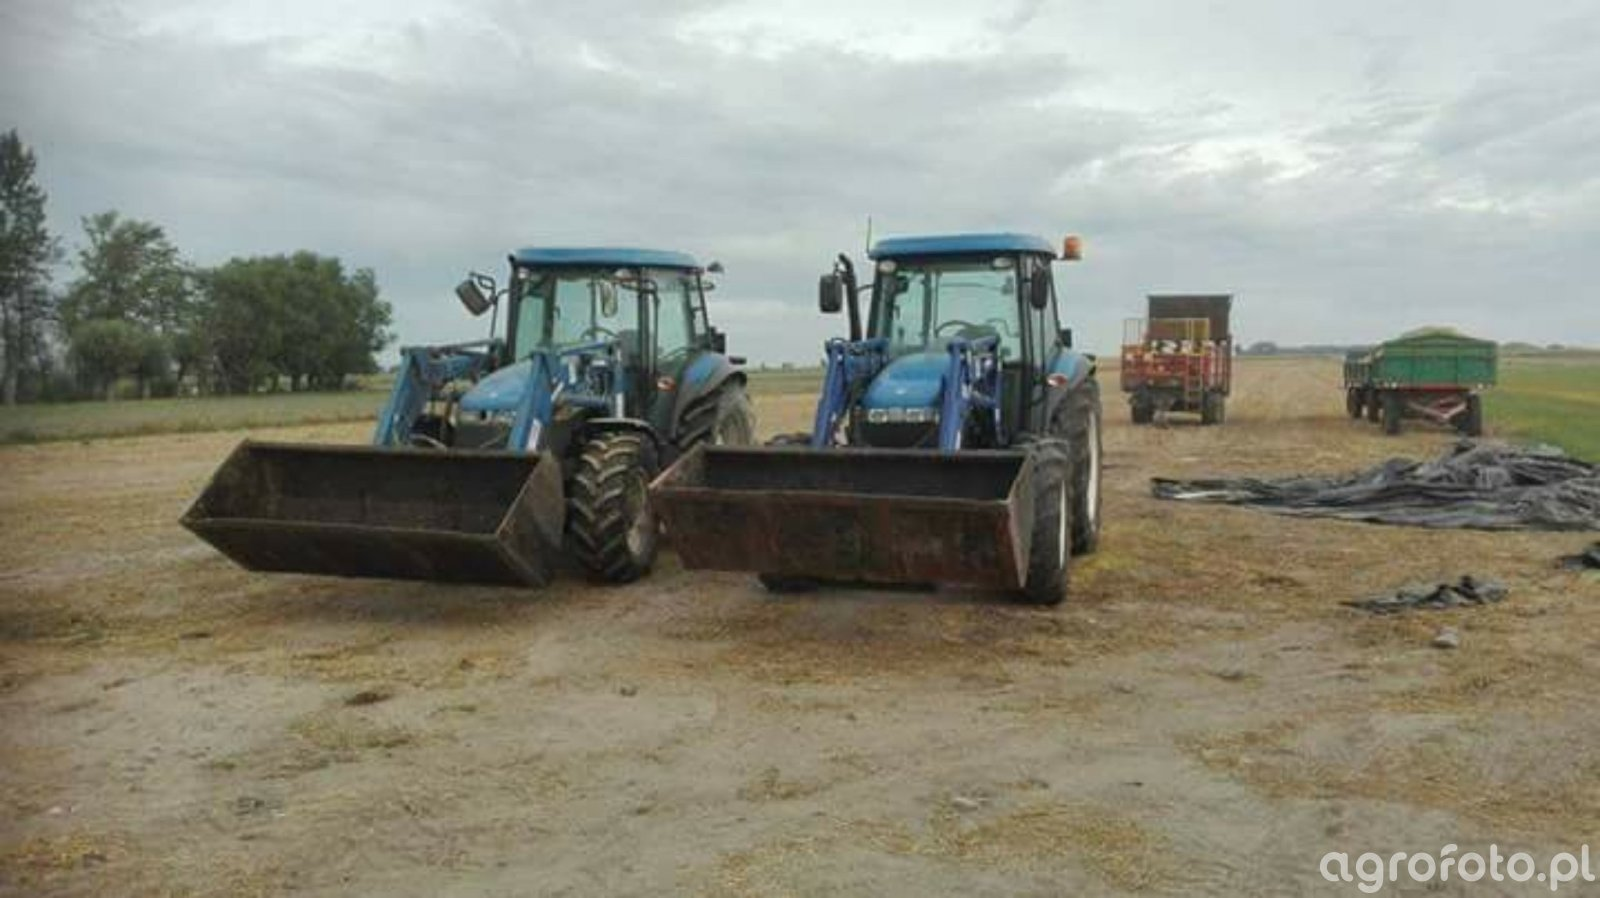 new holland td 5050 & td 5040